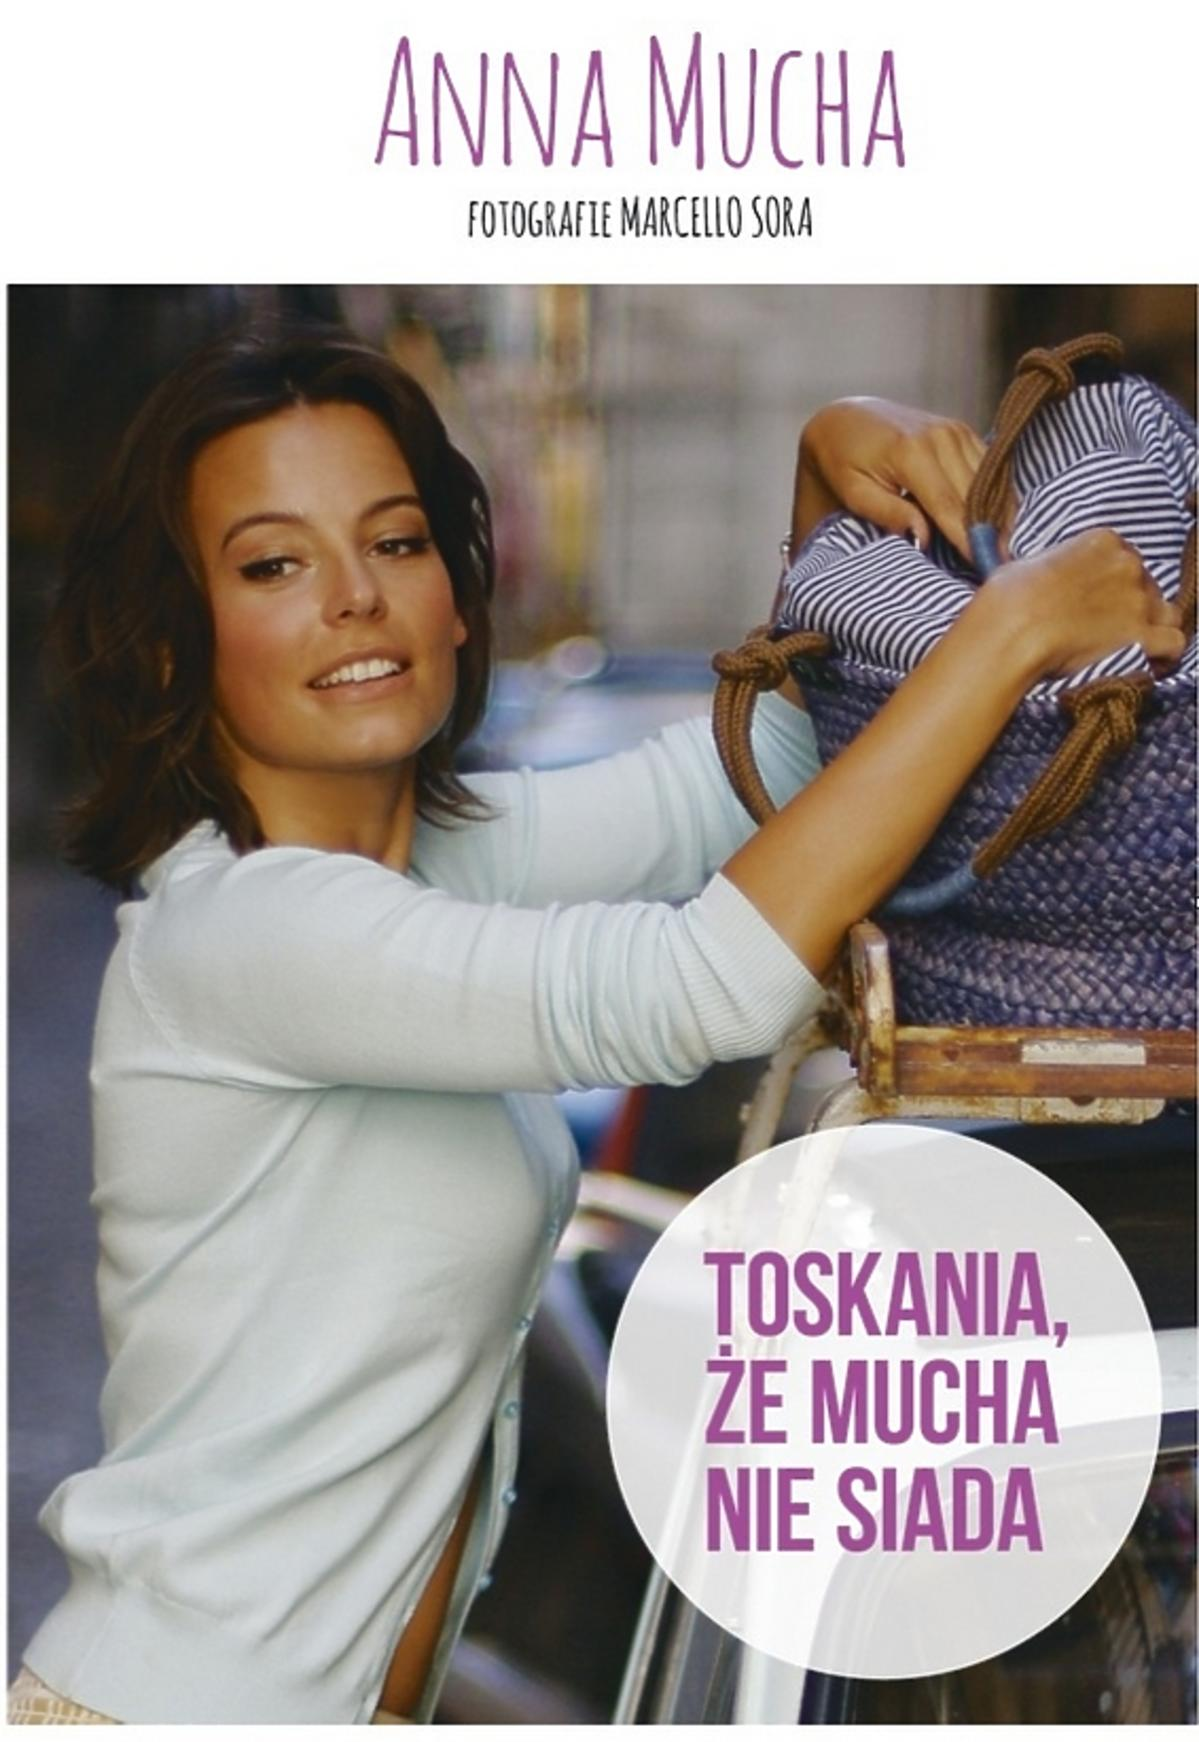 Książka Anny Muchy